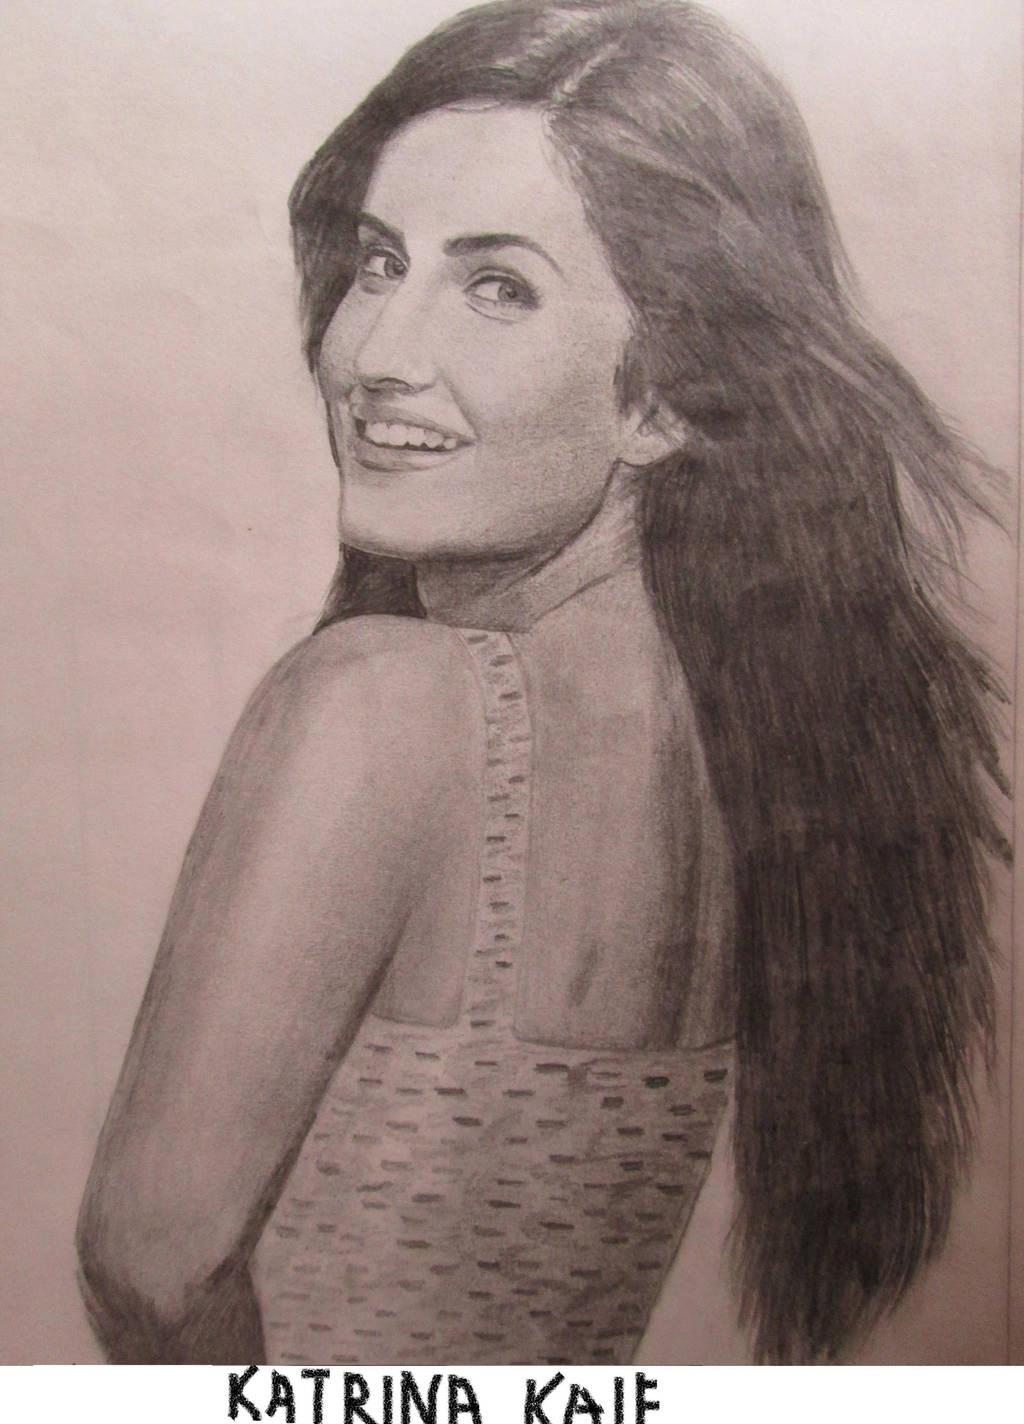 Katrina Kaif's pencil drawing by Pritha-Bhatt